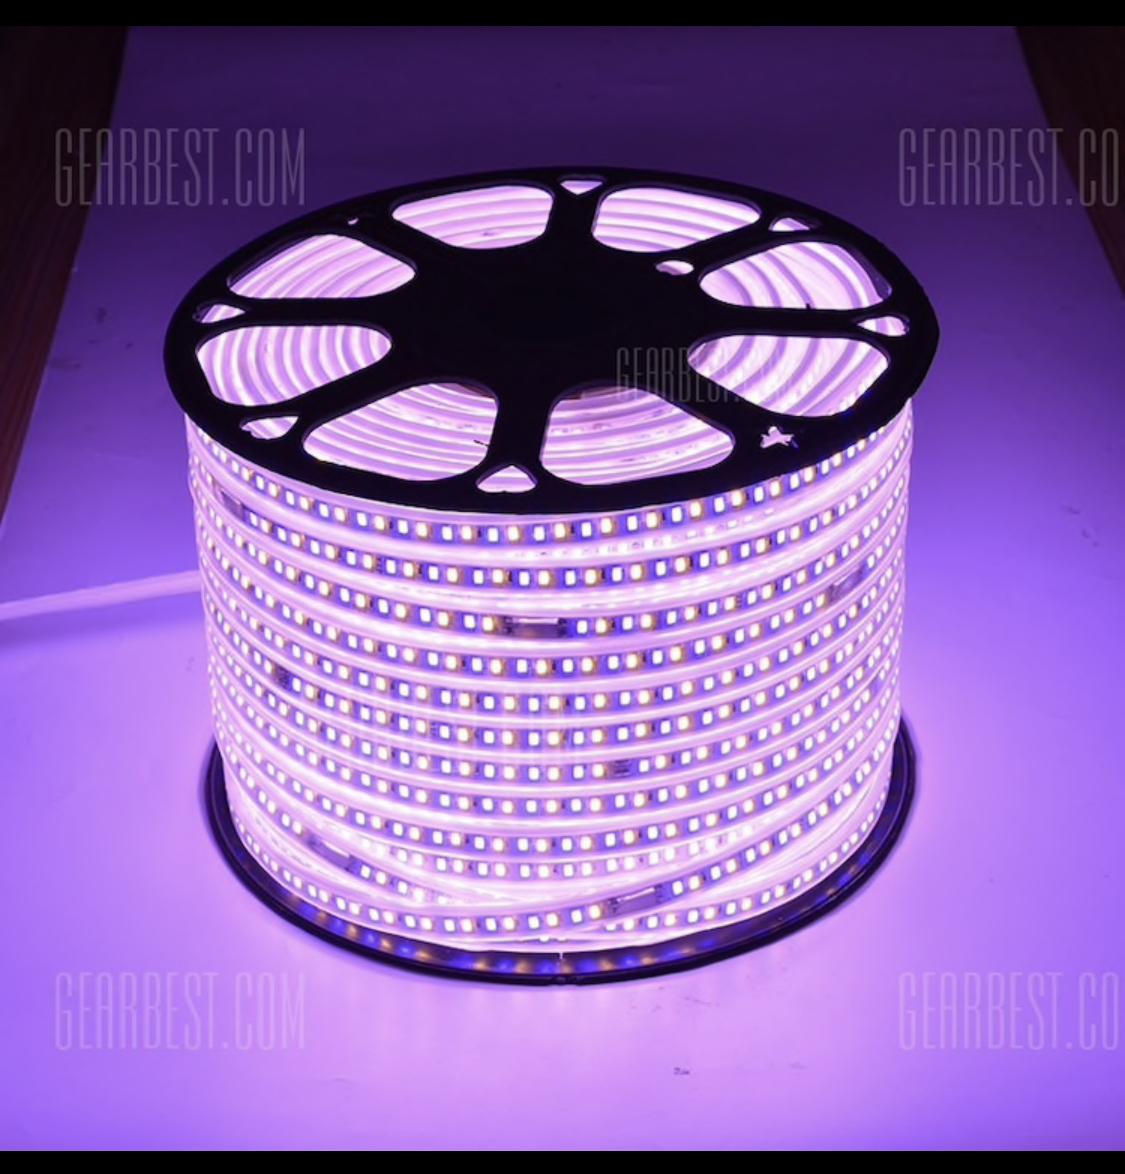 100m led band dimmbar farbig todes billig gearbest. Black Bedroom Furniture Sets. Home Design Ideas